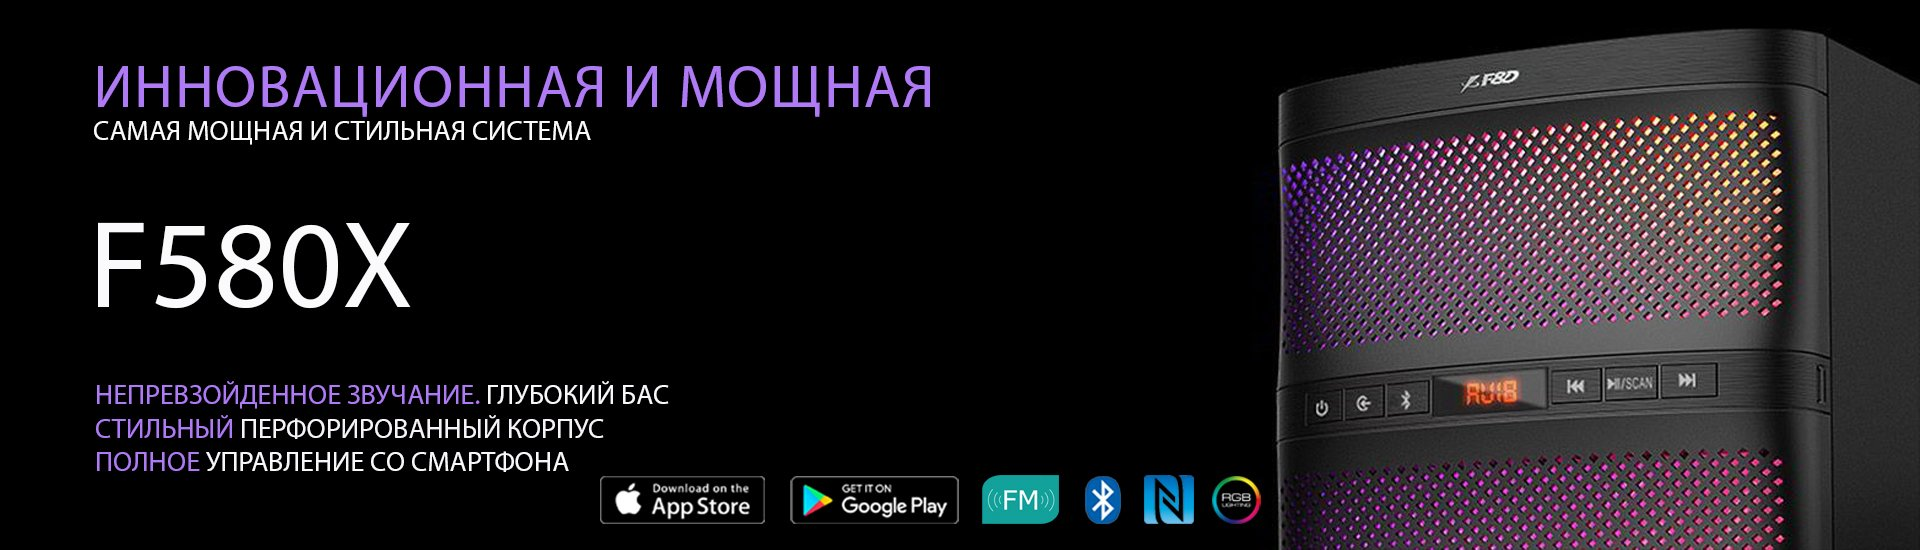 Блютуз мультимедийная акустика f d f580x banner